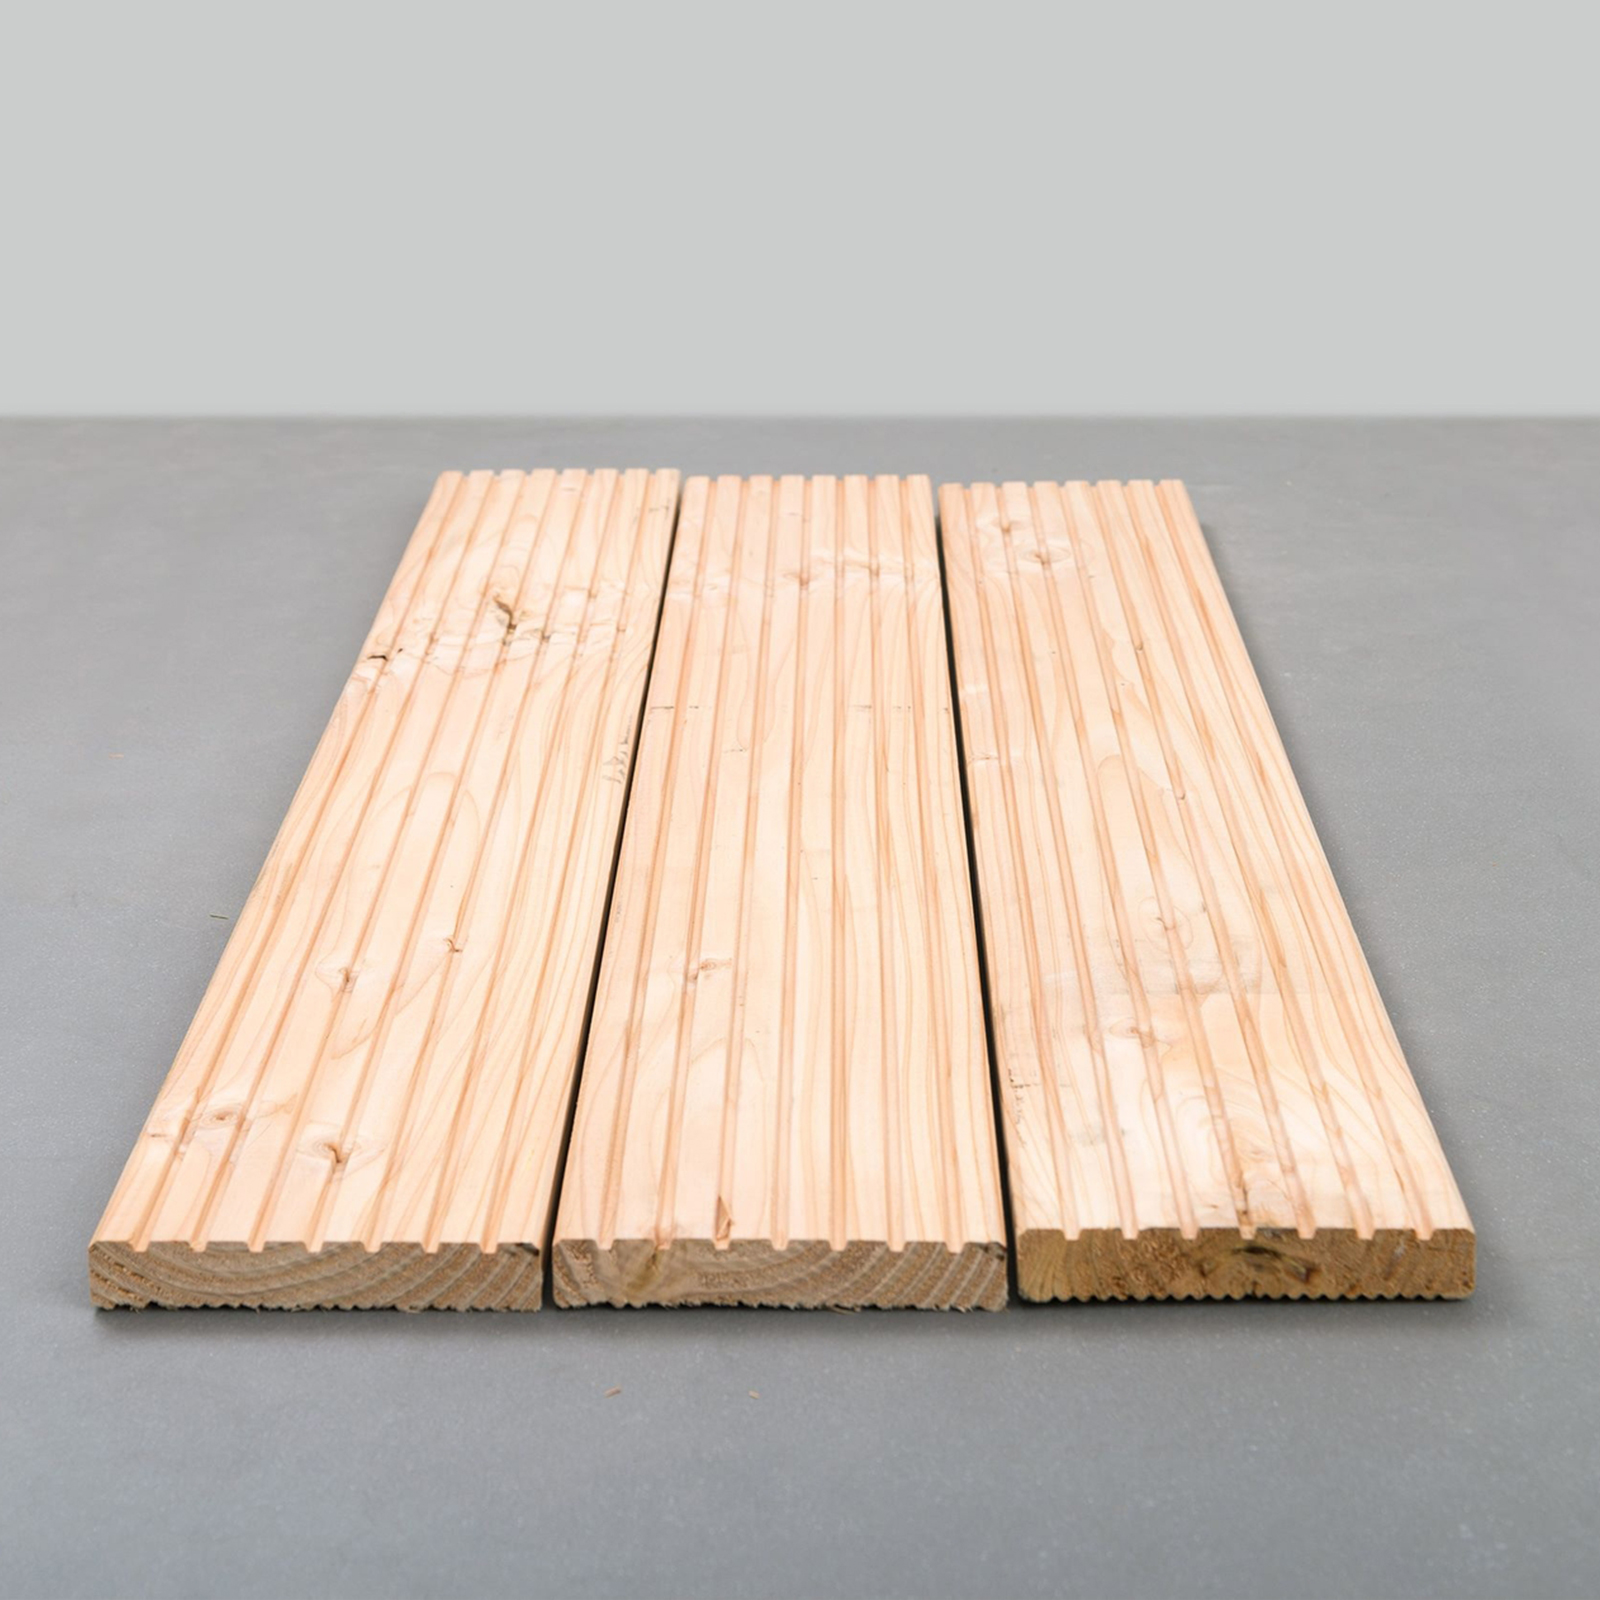 Terrassendiele Holz Lärche massiv Komplettset Komplettbausatz 5-100 m²